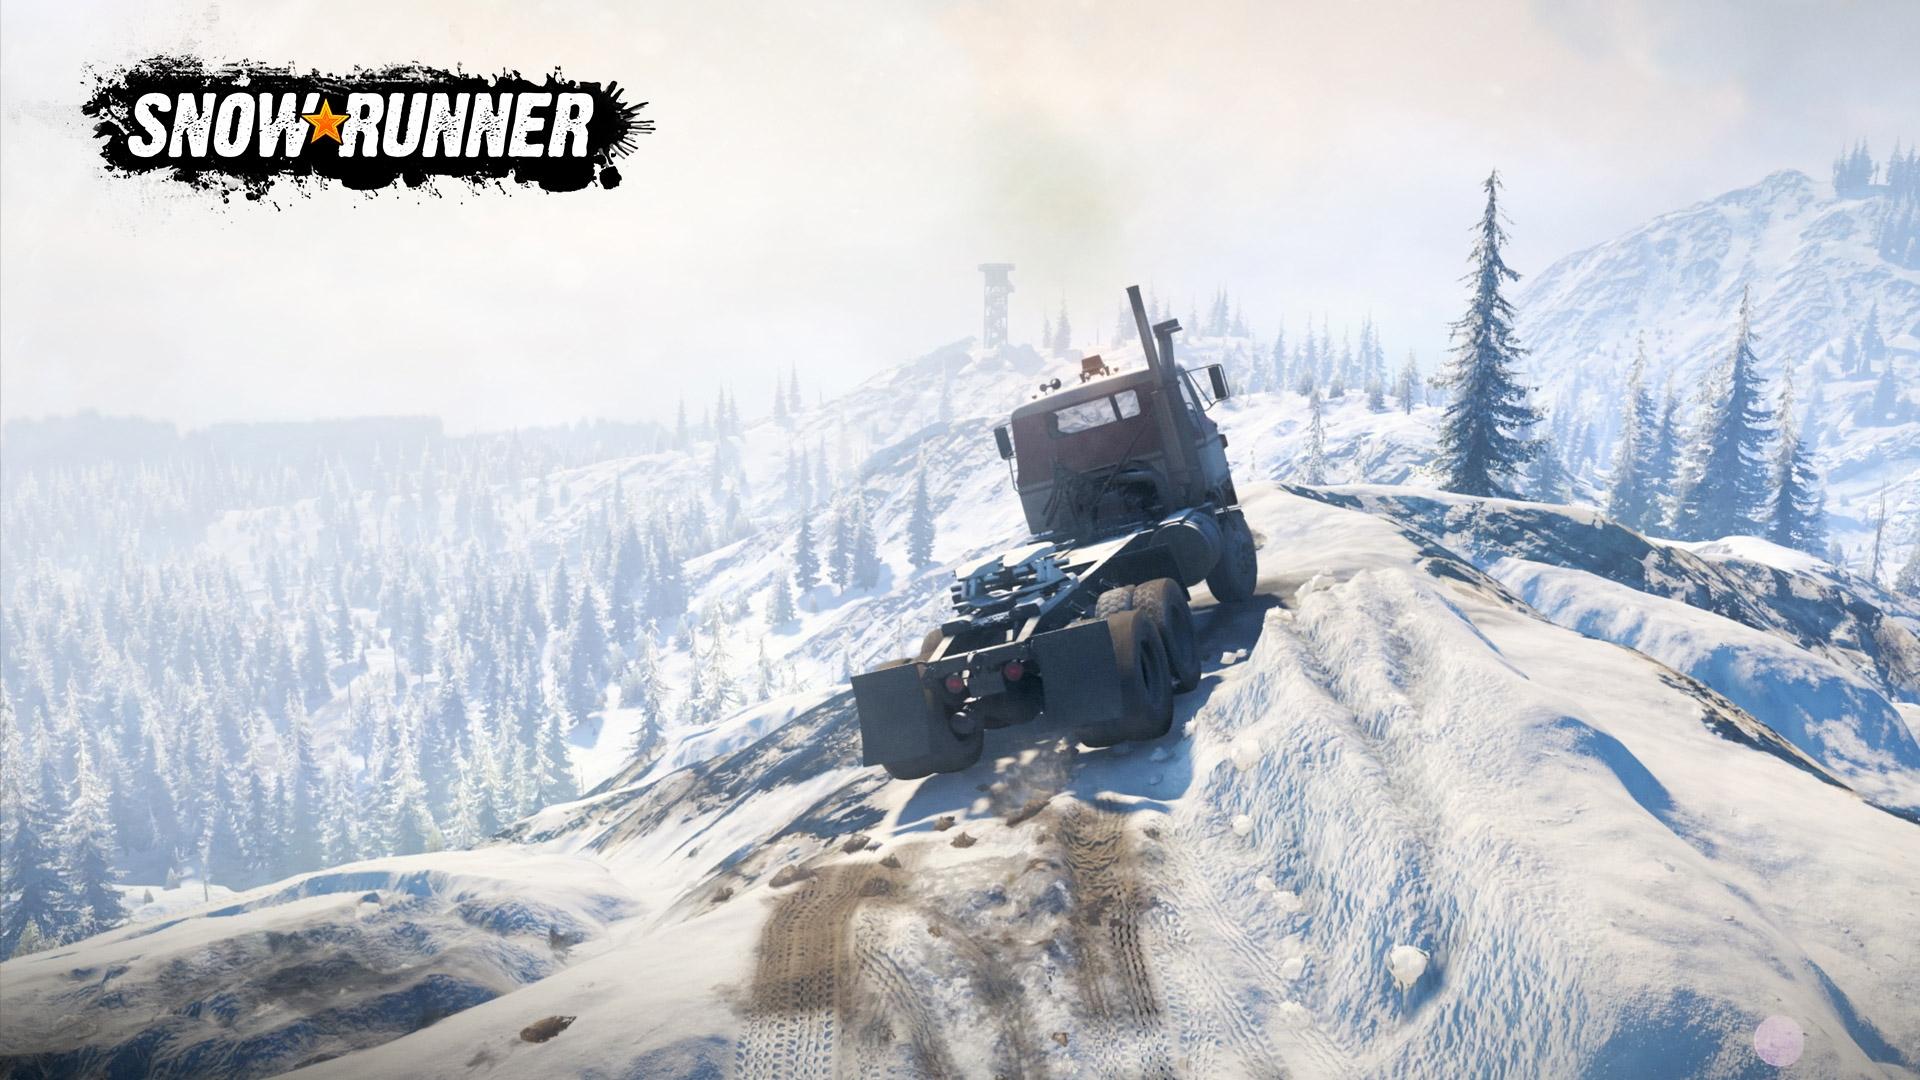 SnowRunner | WW (2b17d6ae-7a37-4663-be83-4438c4ec1d48)